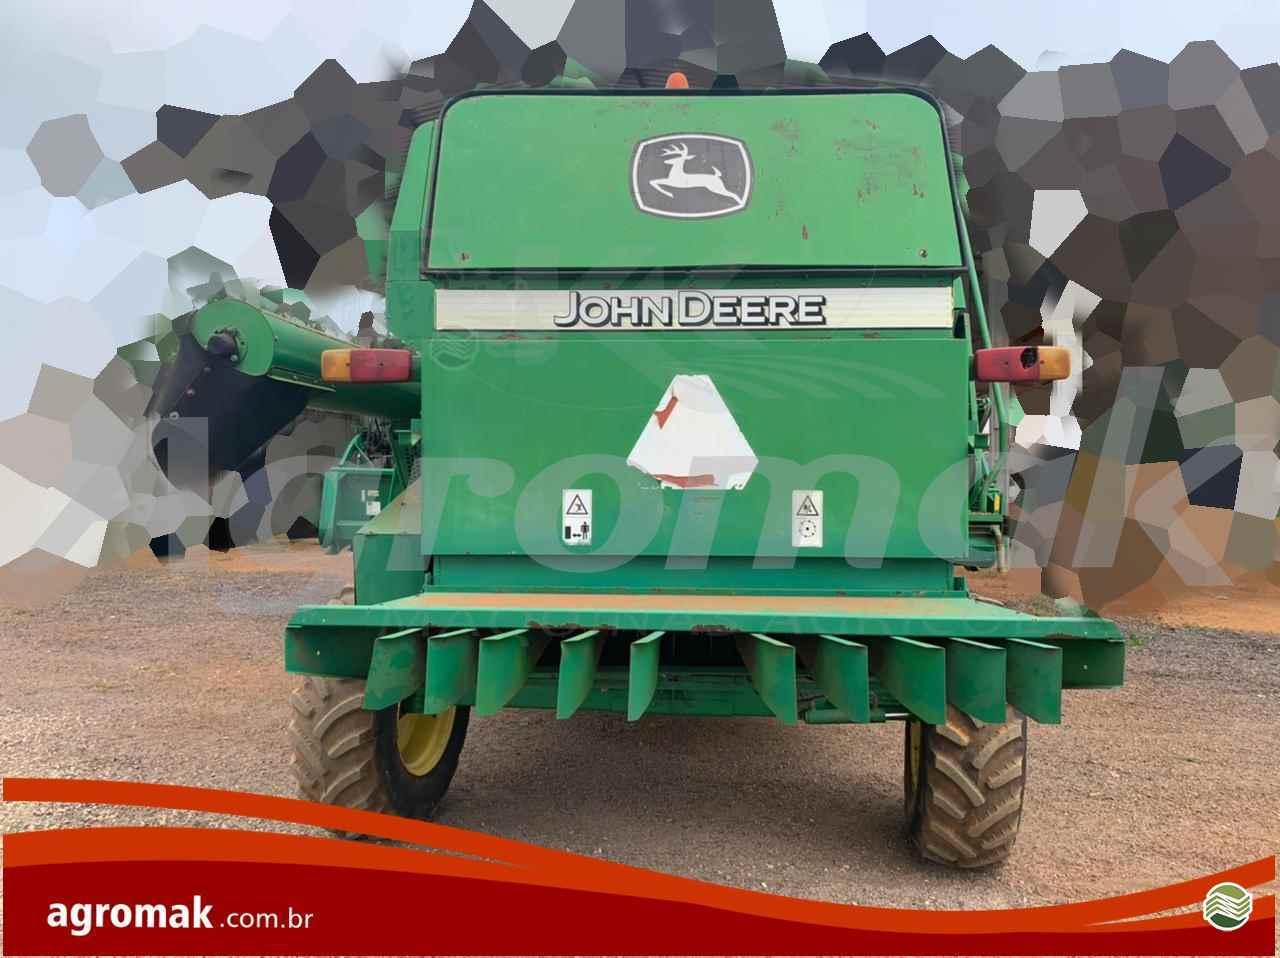 JOHN DEERE JOHN DEERE 1550  2004/2004 Agromak Máquinas Agrícolas